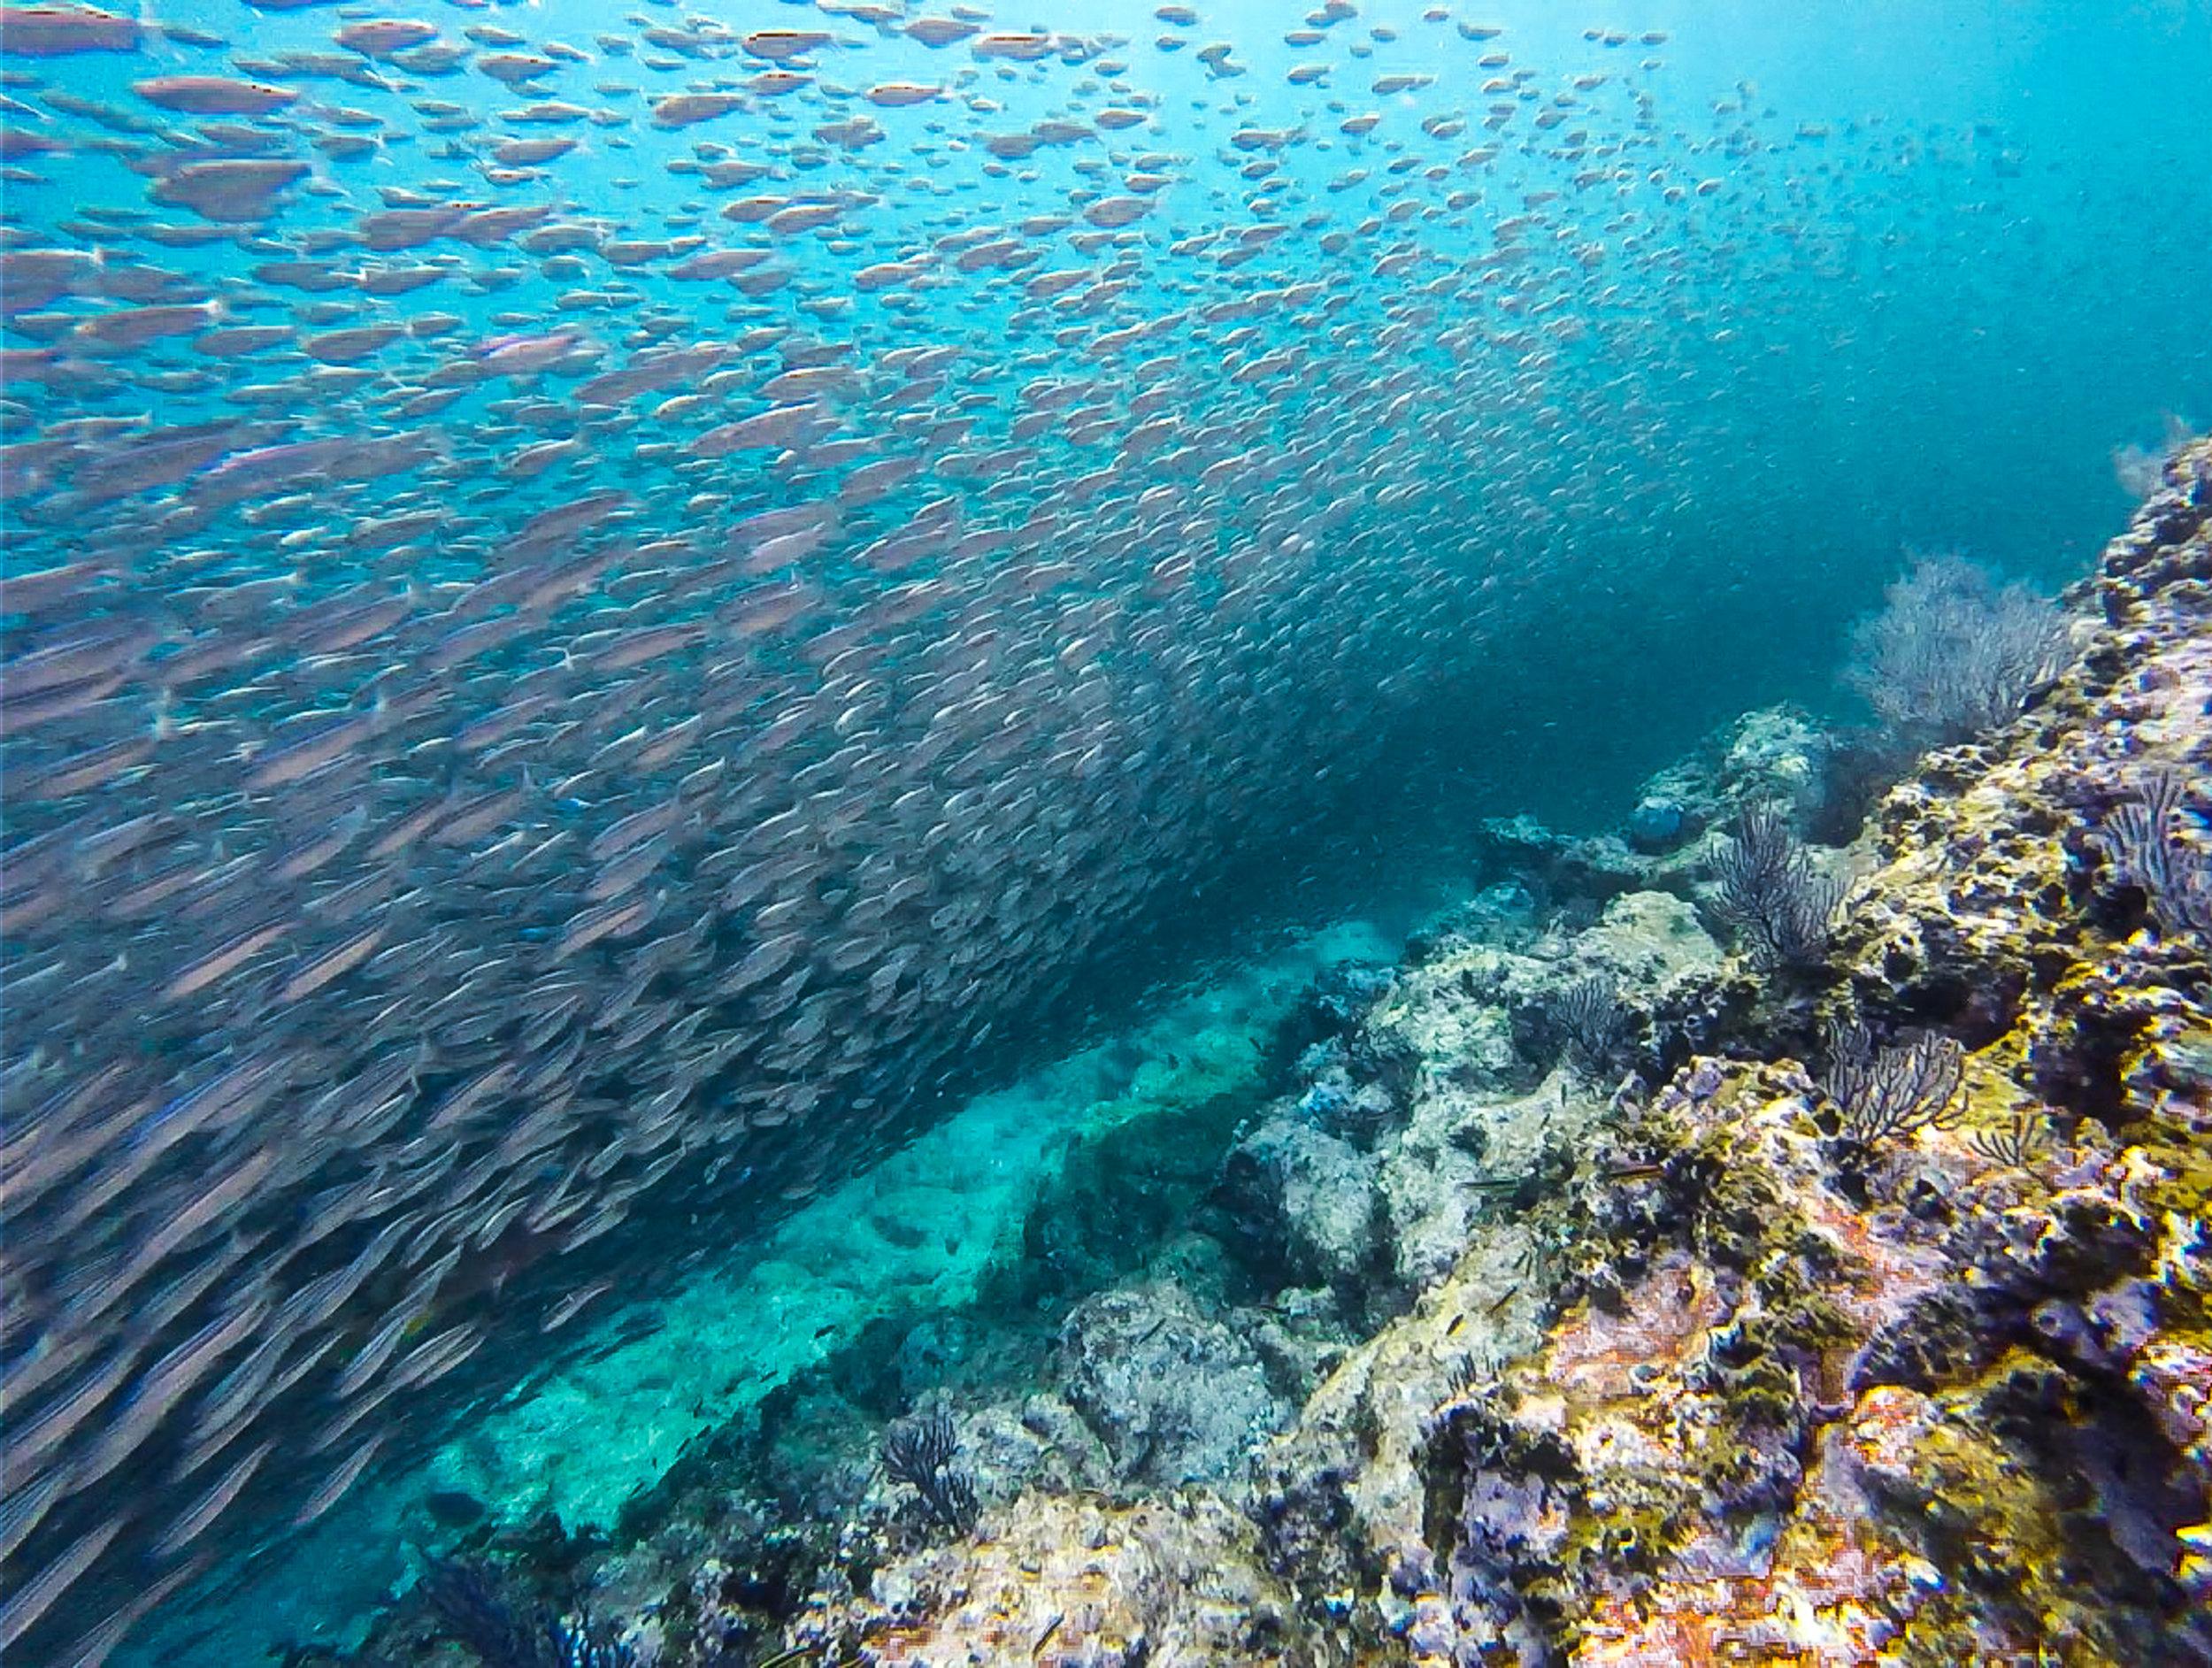 Conveyor belt of Sardines.